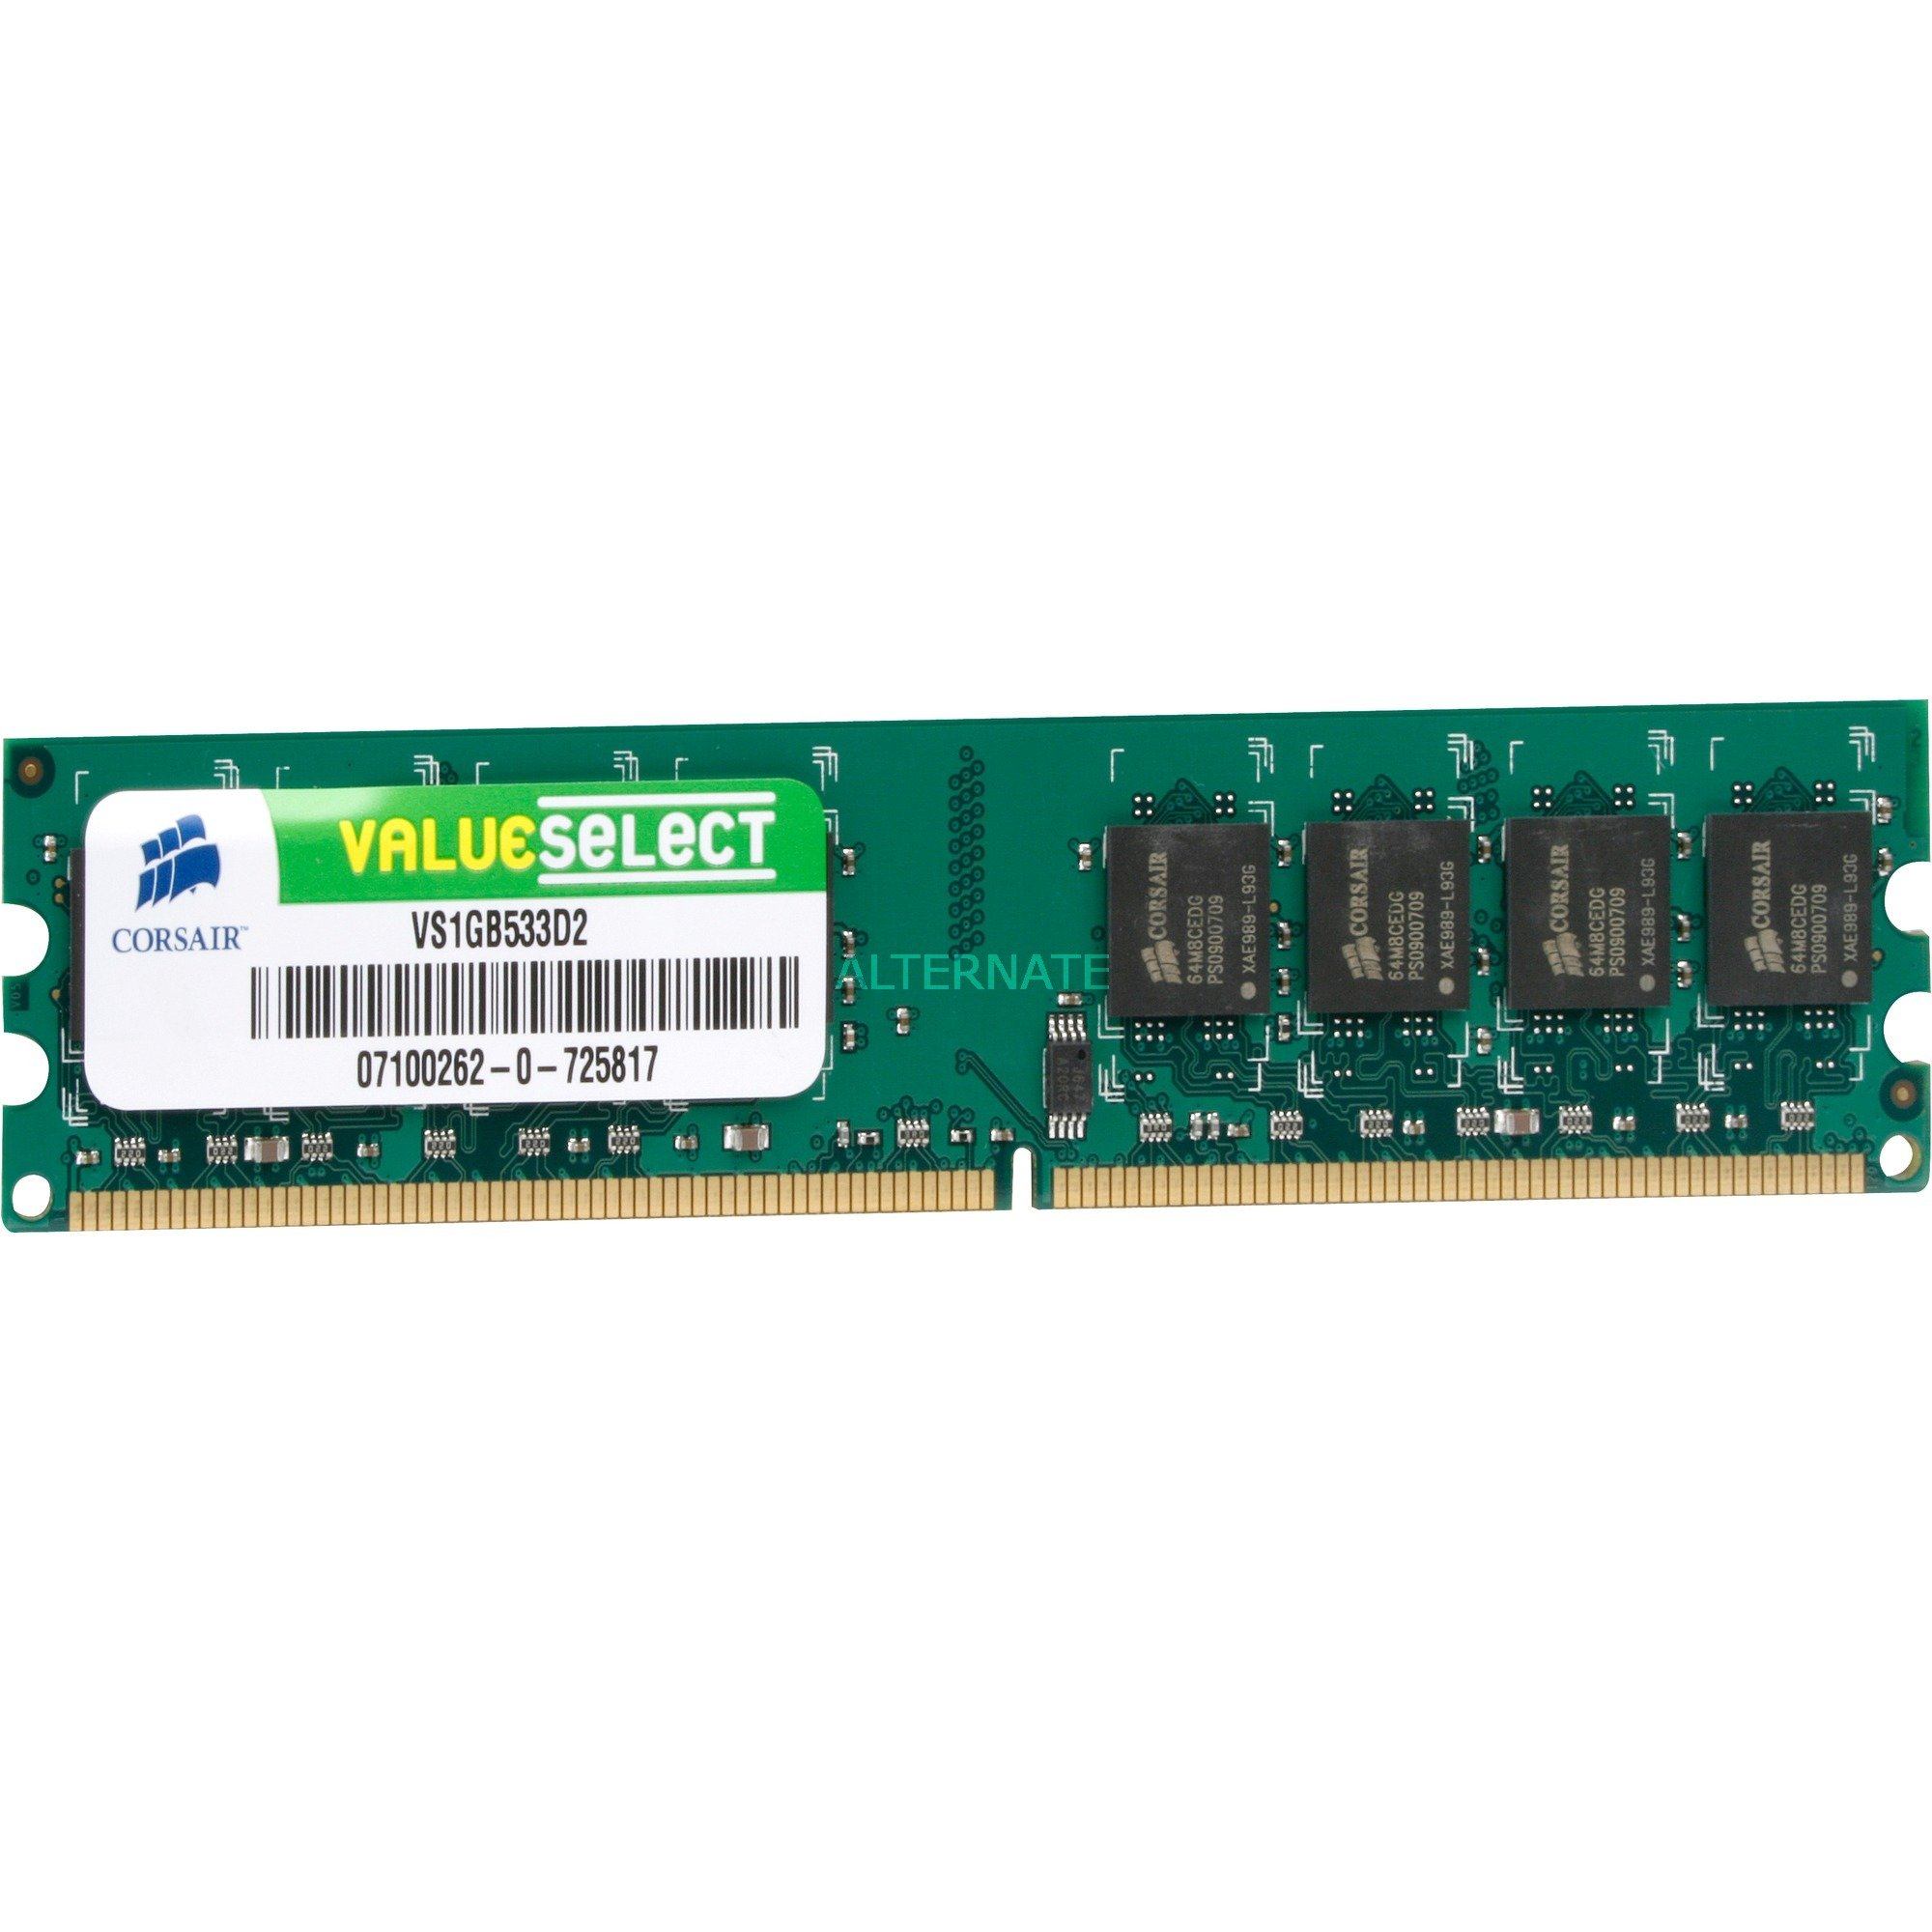 1GB DDR2 SDRAM DIMM 1GB DDR2 533MHz módulo de memoria, Memoria RAM